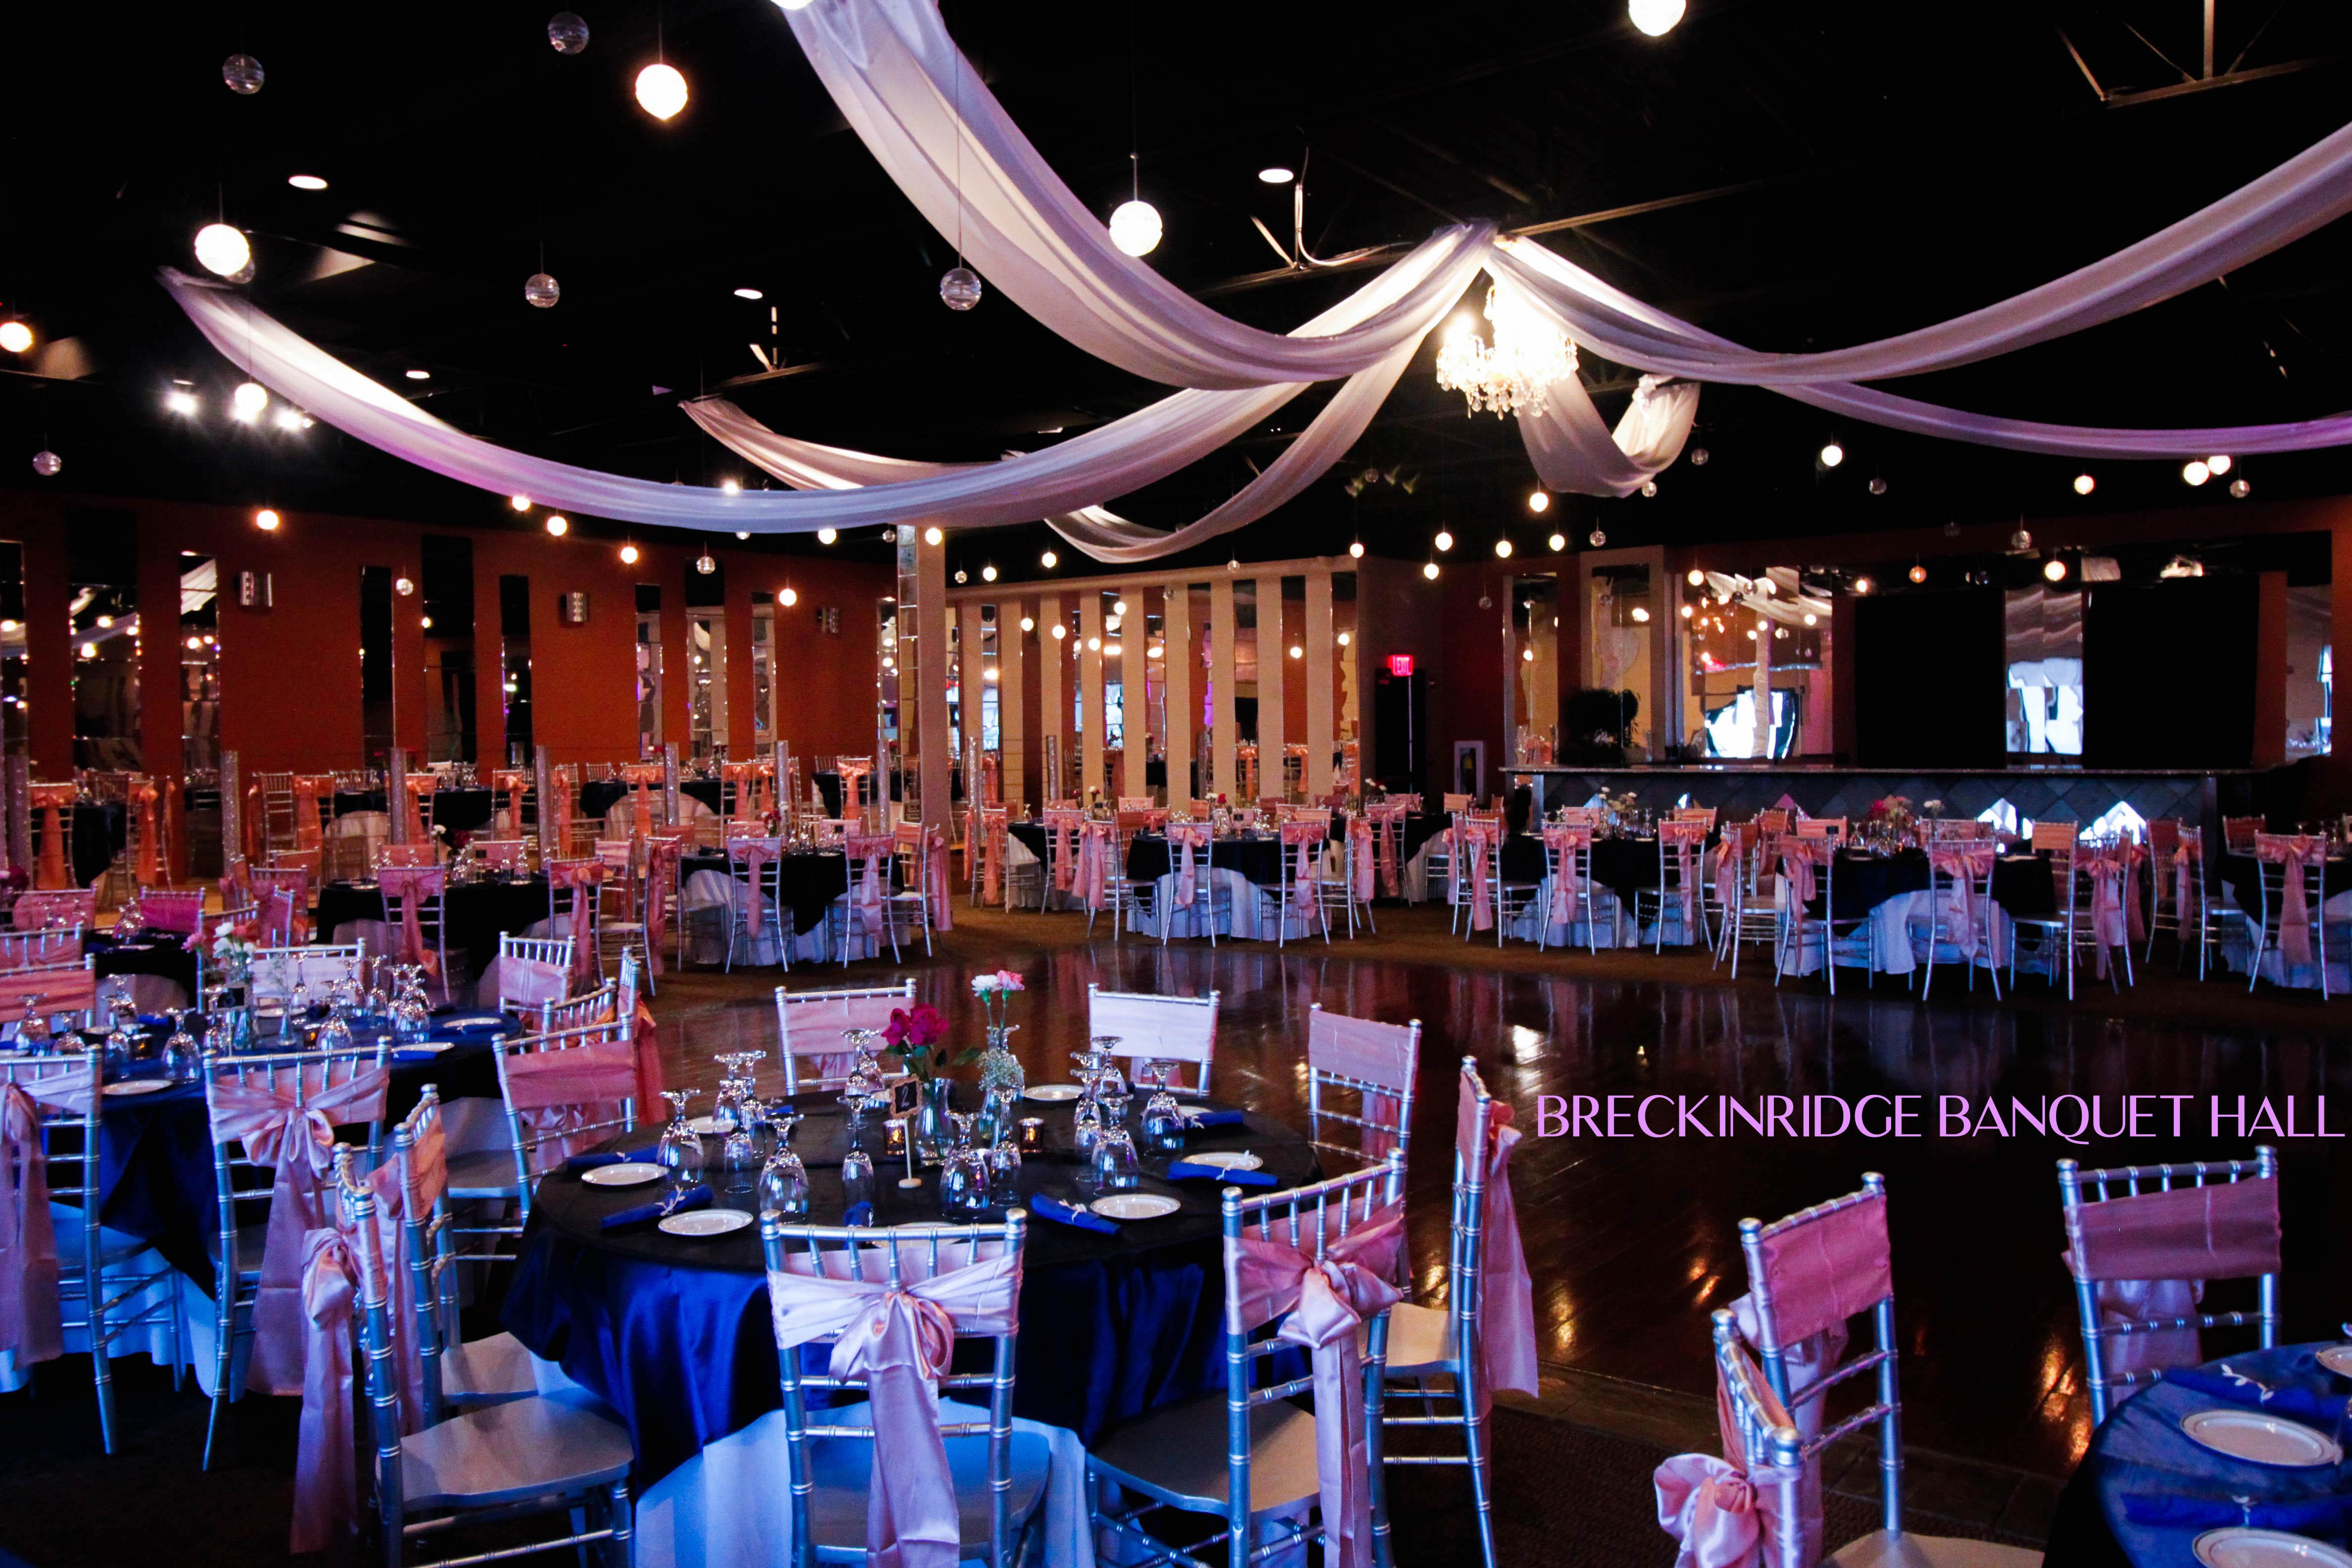 Breckinridge Banquet Hall – Breckinridge Banquet Hall